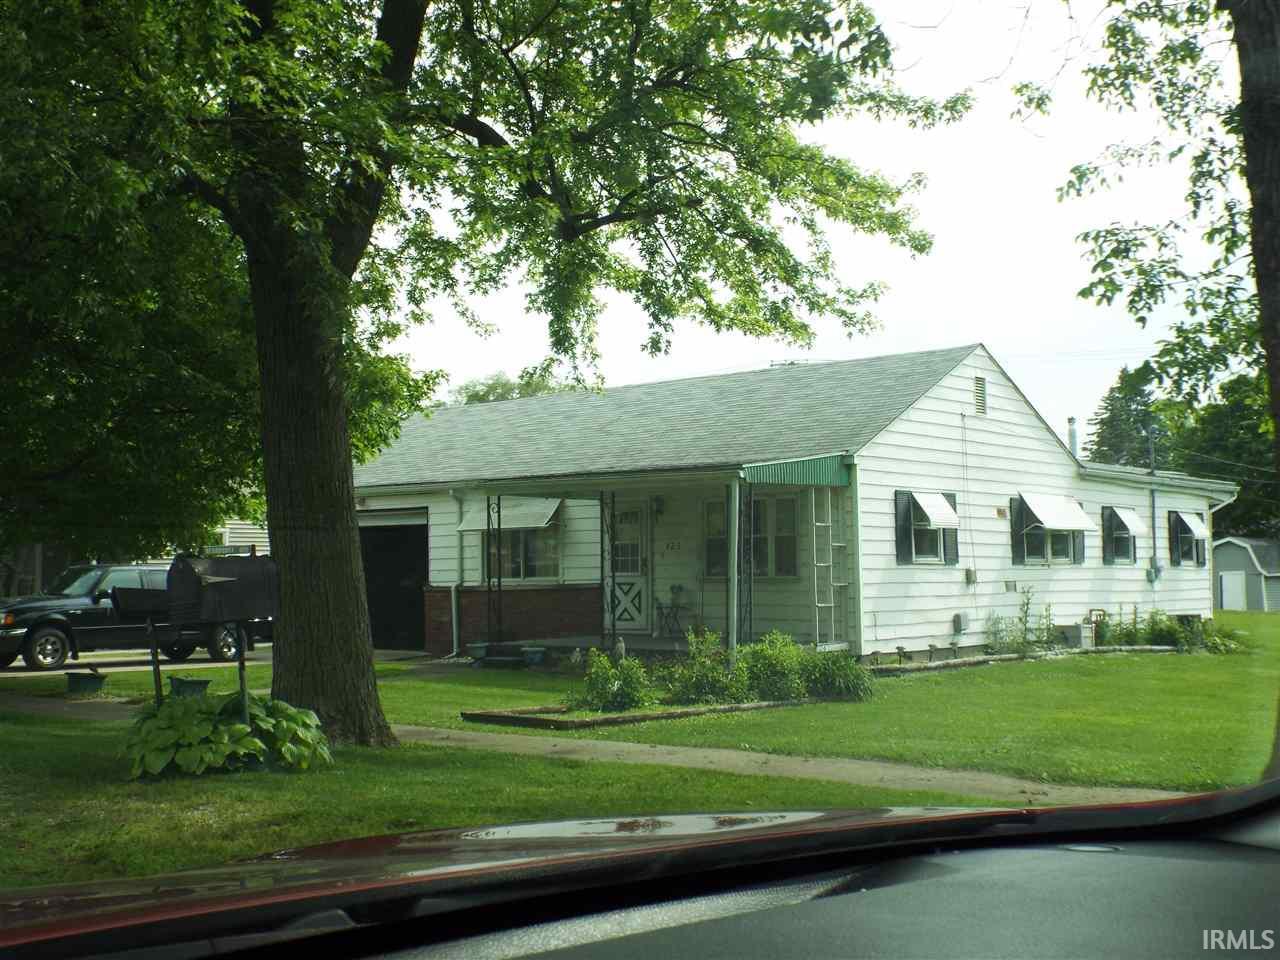 425 N Ohio, Remington, IN 47977